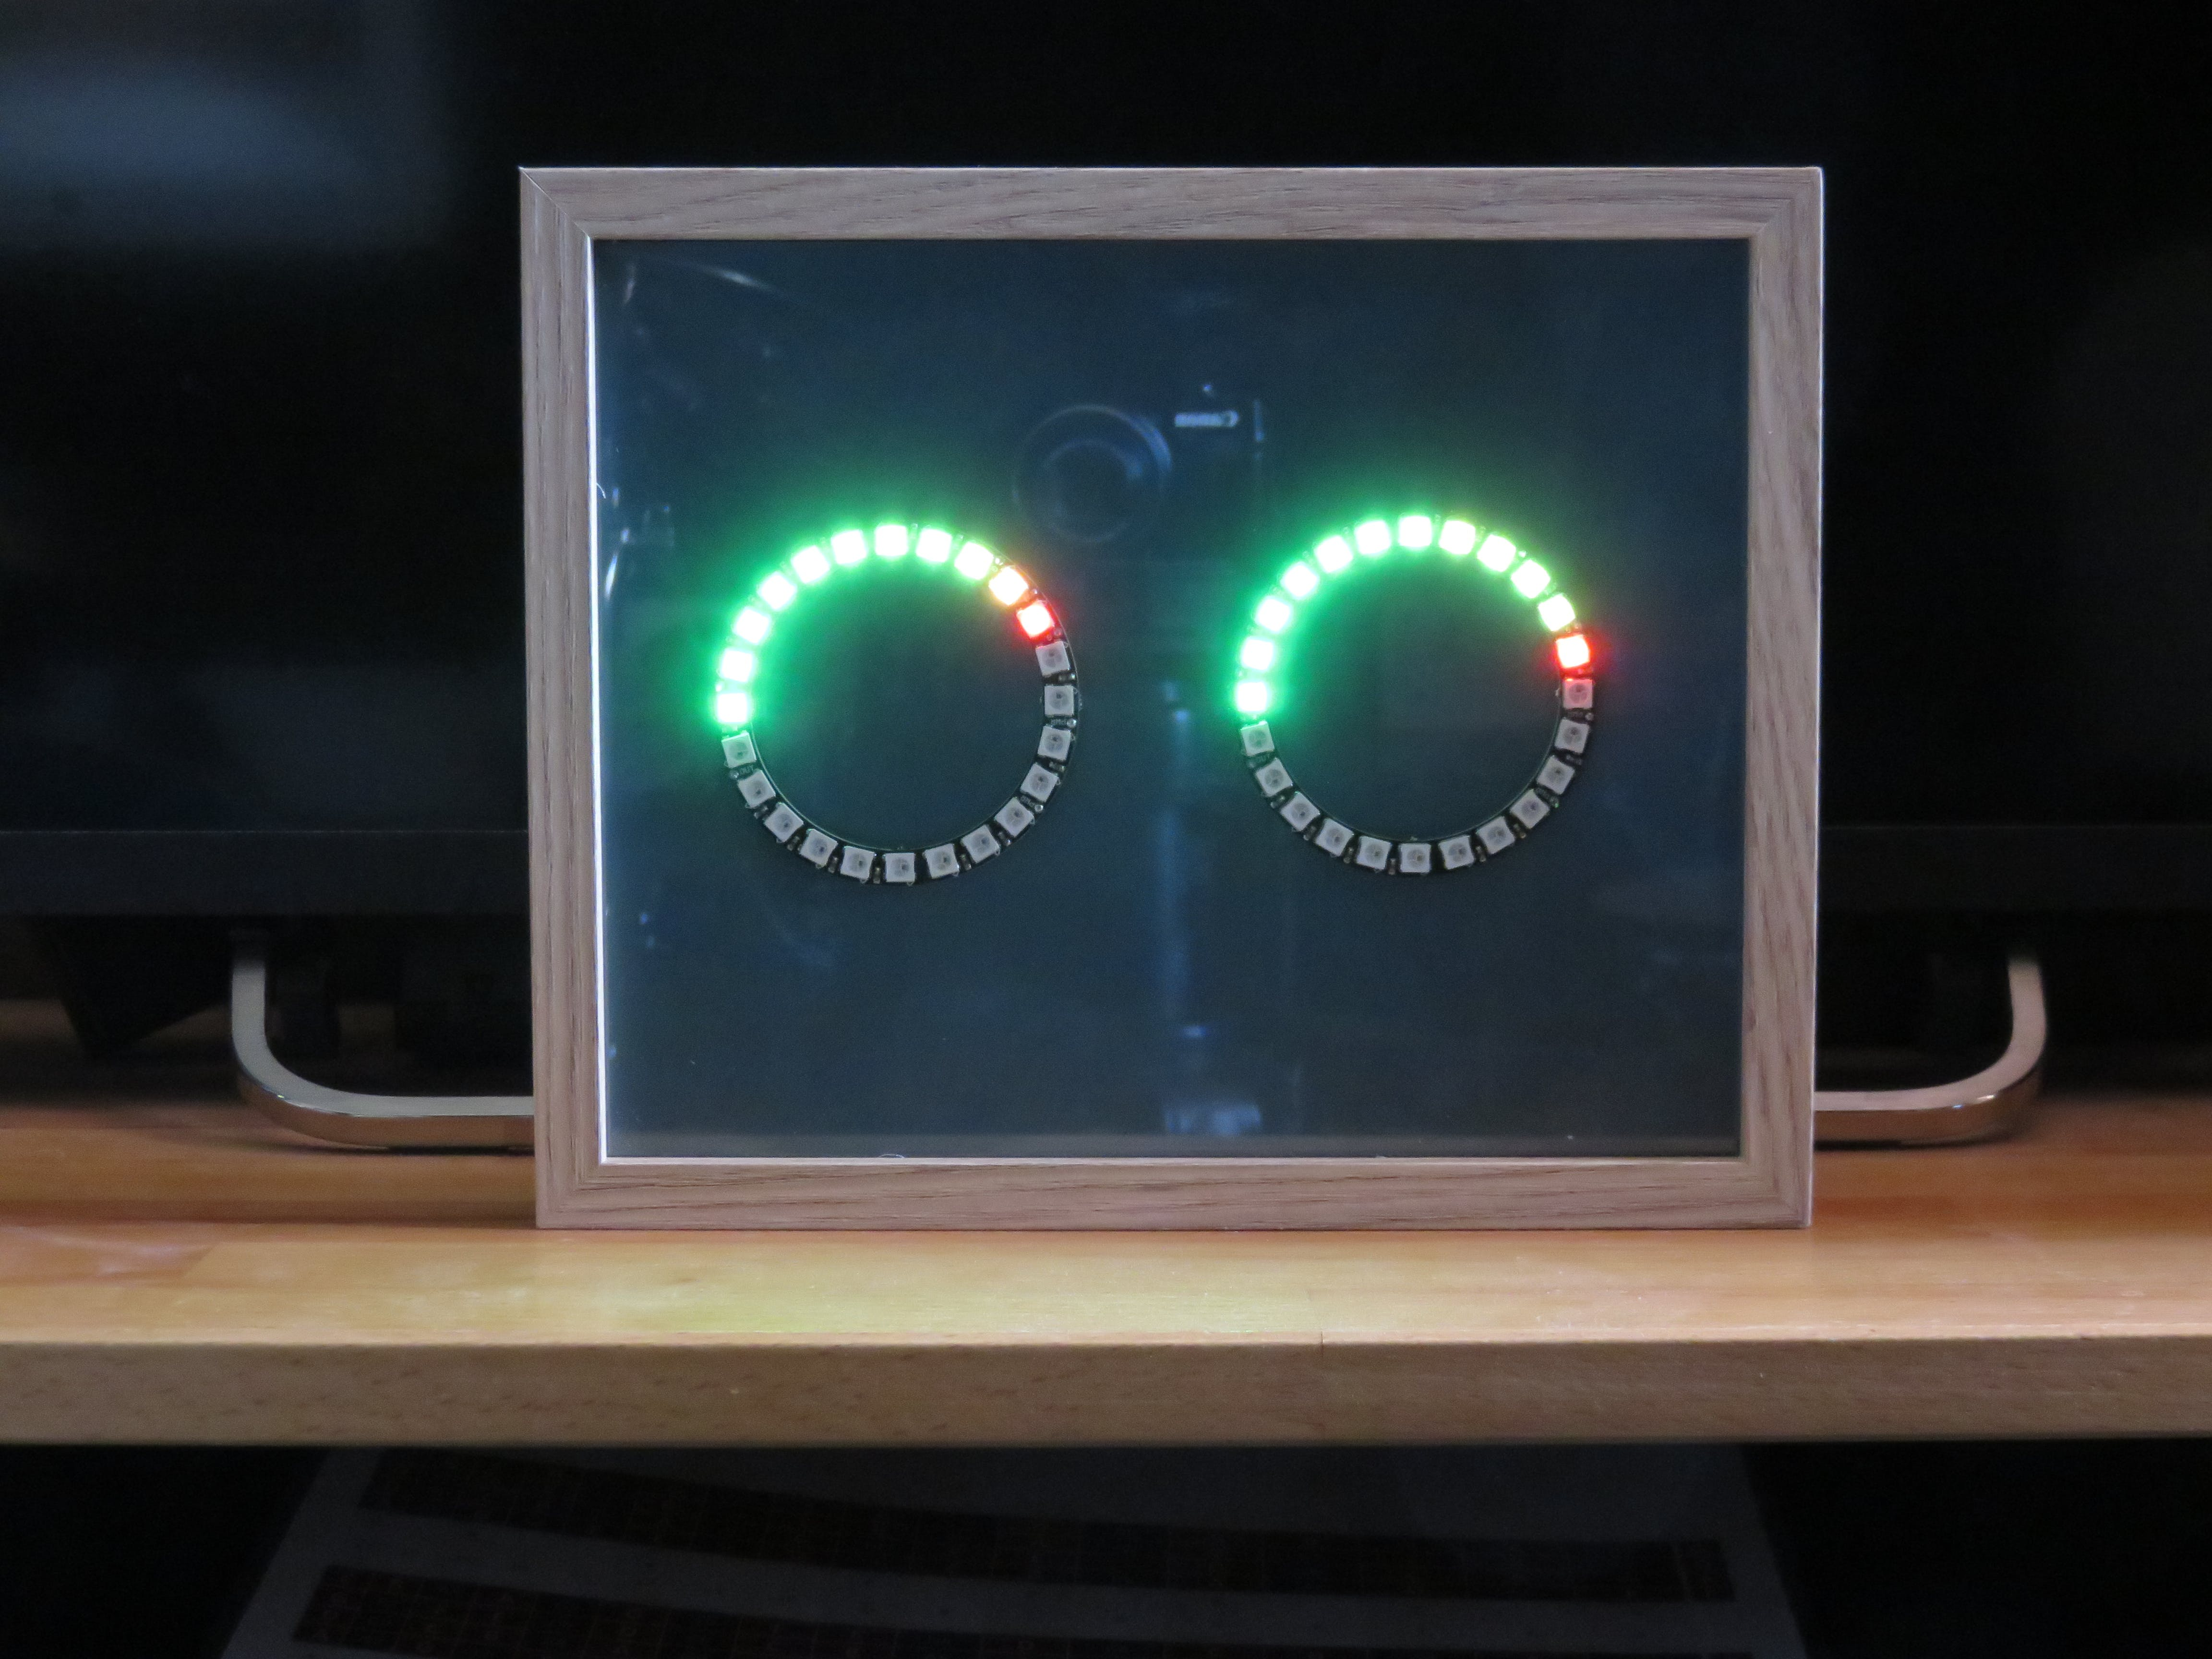 The VU meter in a photo frame